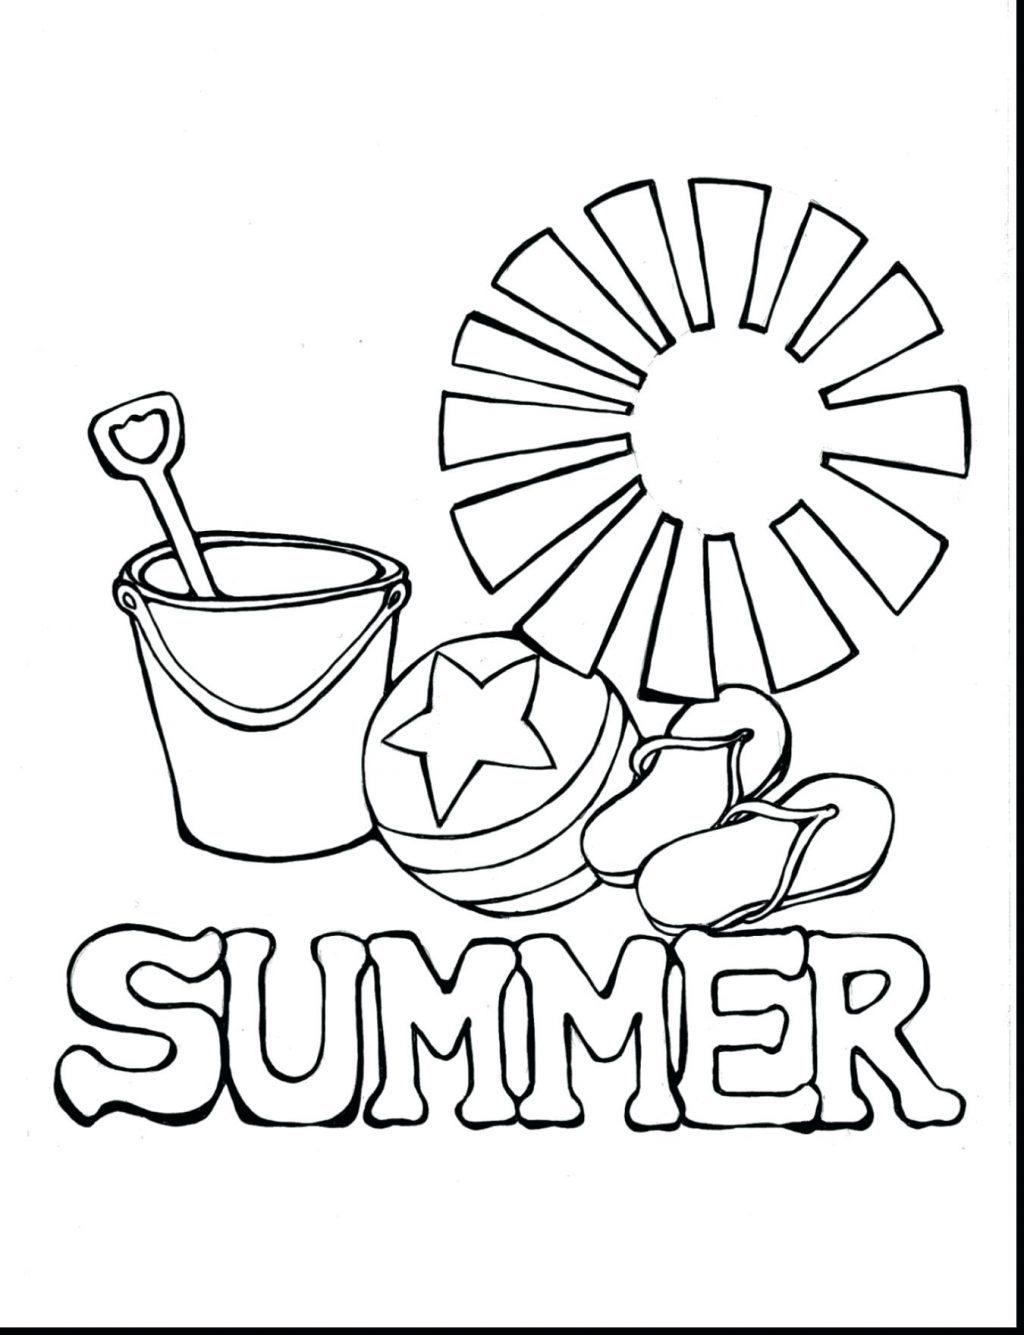 4th Grade Summer Reading List Worksheet Template 1st Math Coloring